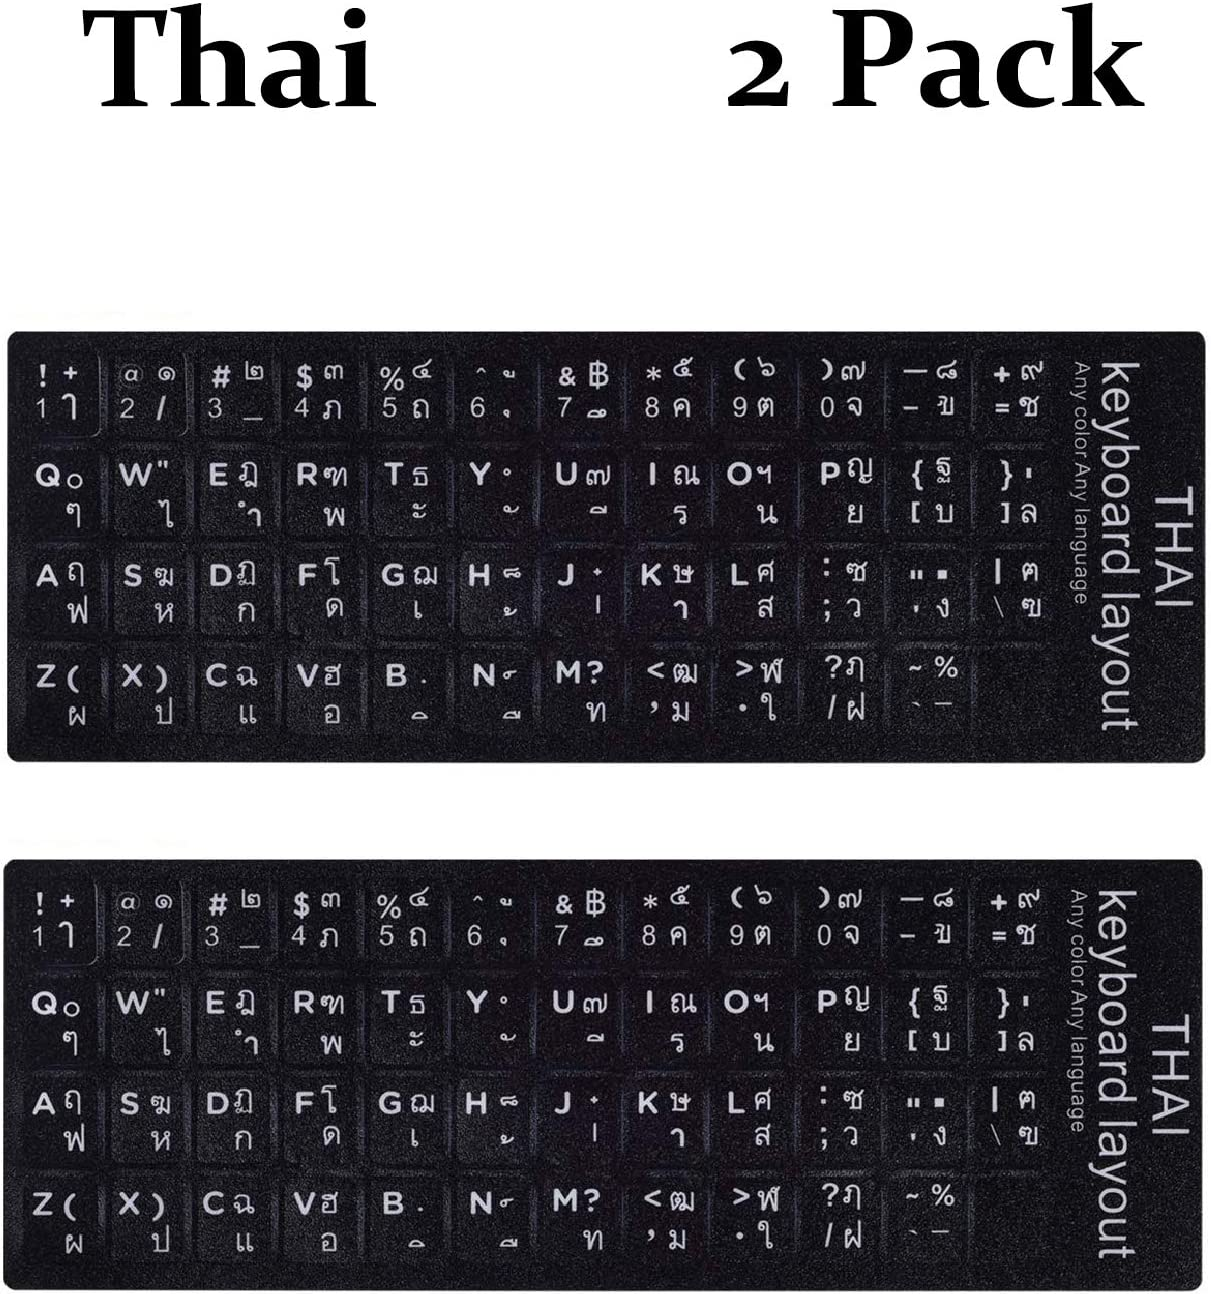 2PCSPackThaiKeyboardStickers,ThaiEnglishKeyboardReplacementStickerwithBlackBackgroundandWhiteLetteringforComputerNotebookLaptopDesktopKeyboards